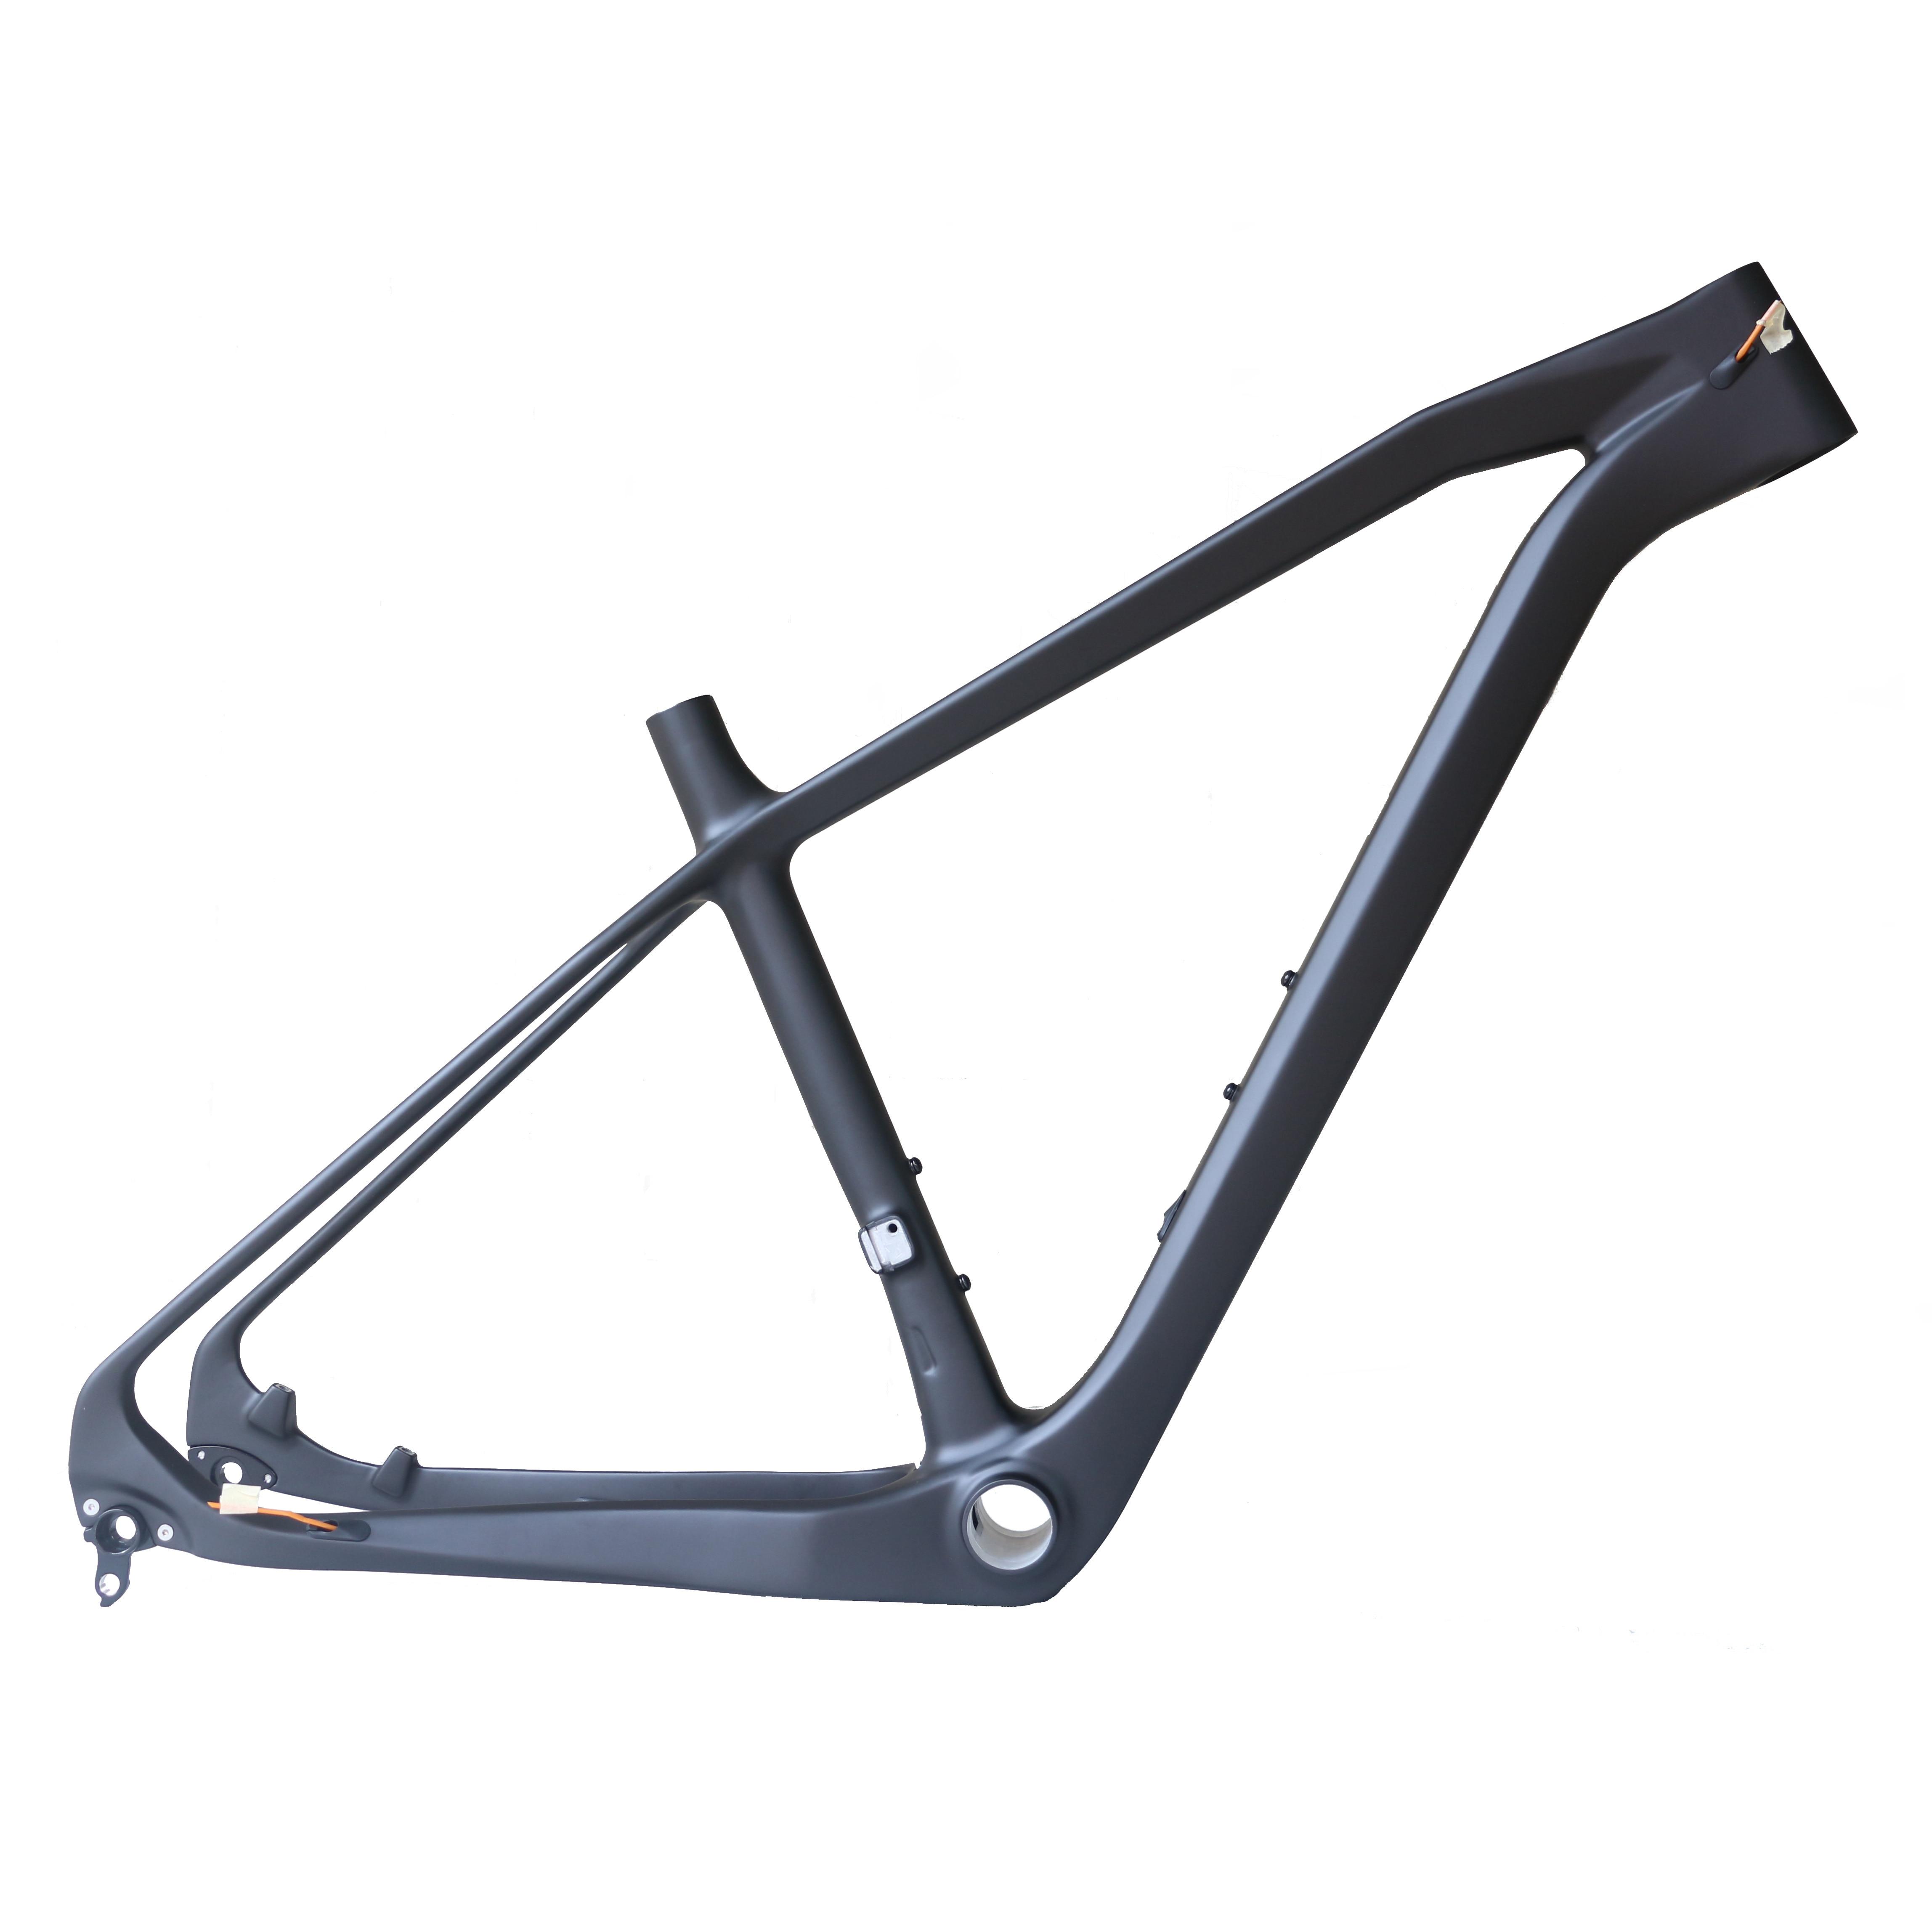 Toray Carbon Fiberi T700 27.5er*2.35  Hard Tail MTB Bike Frame  BB92with 650B Internal Cable Mountain Bike Frame For FM406